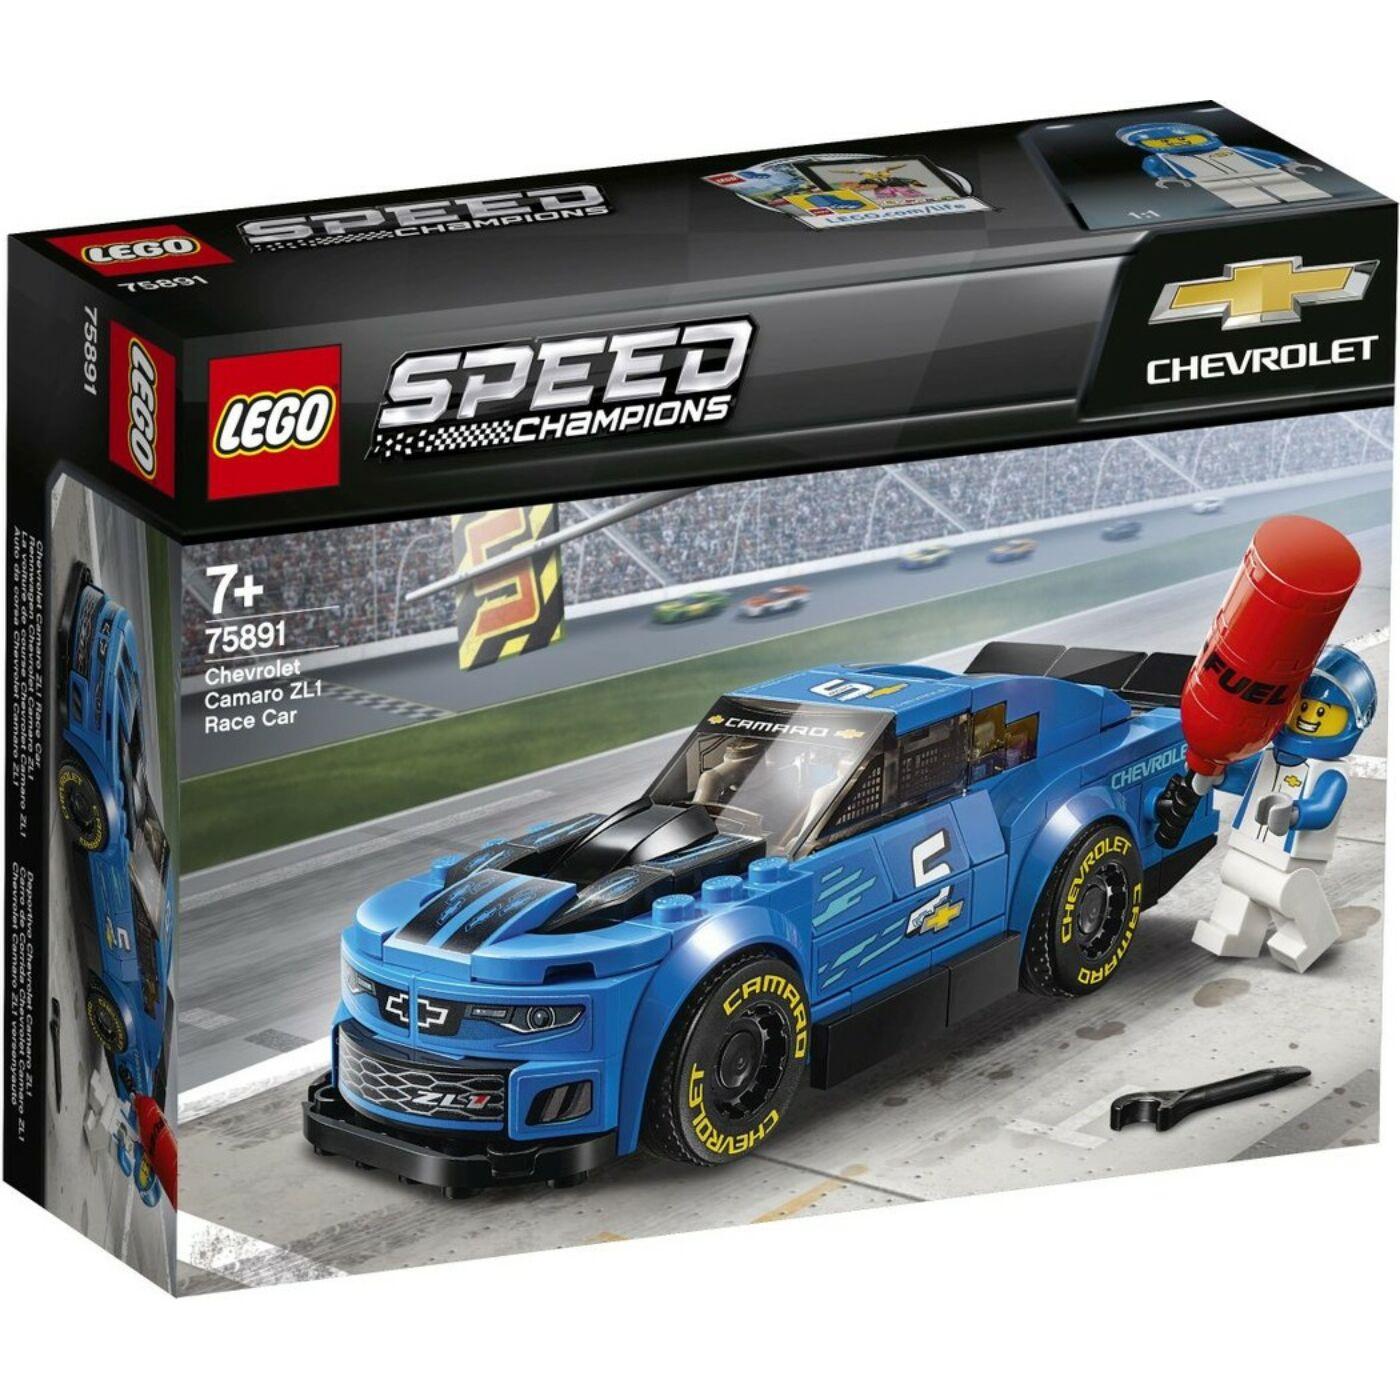 Lego Speed Champions Chevrolet Camaro ZL1 versenyautó